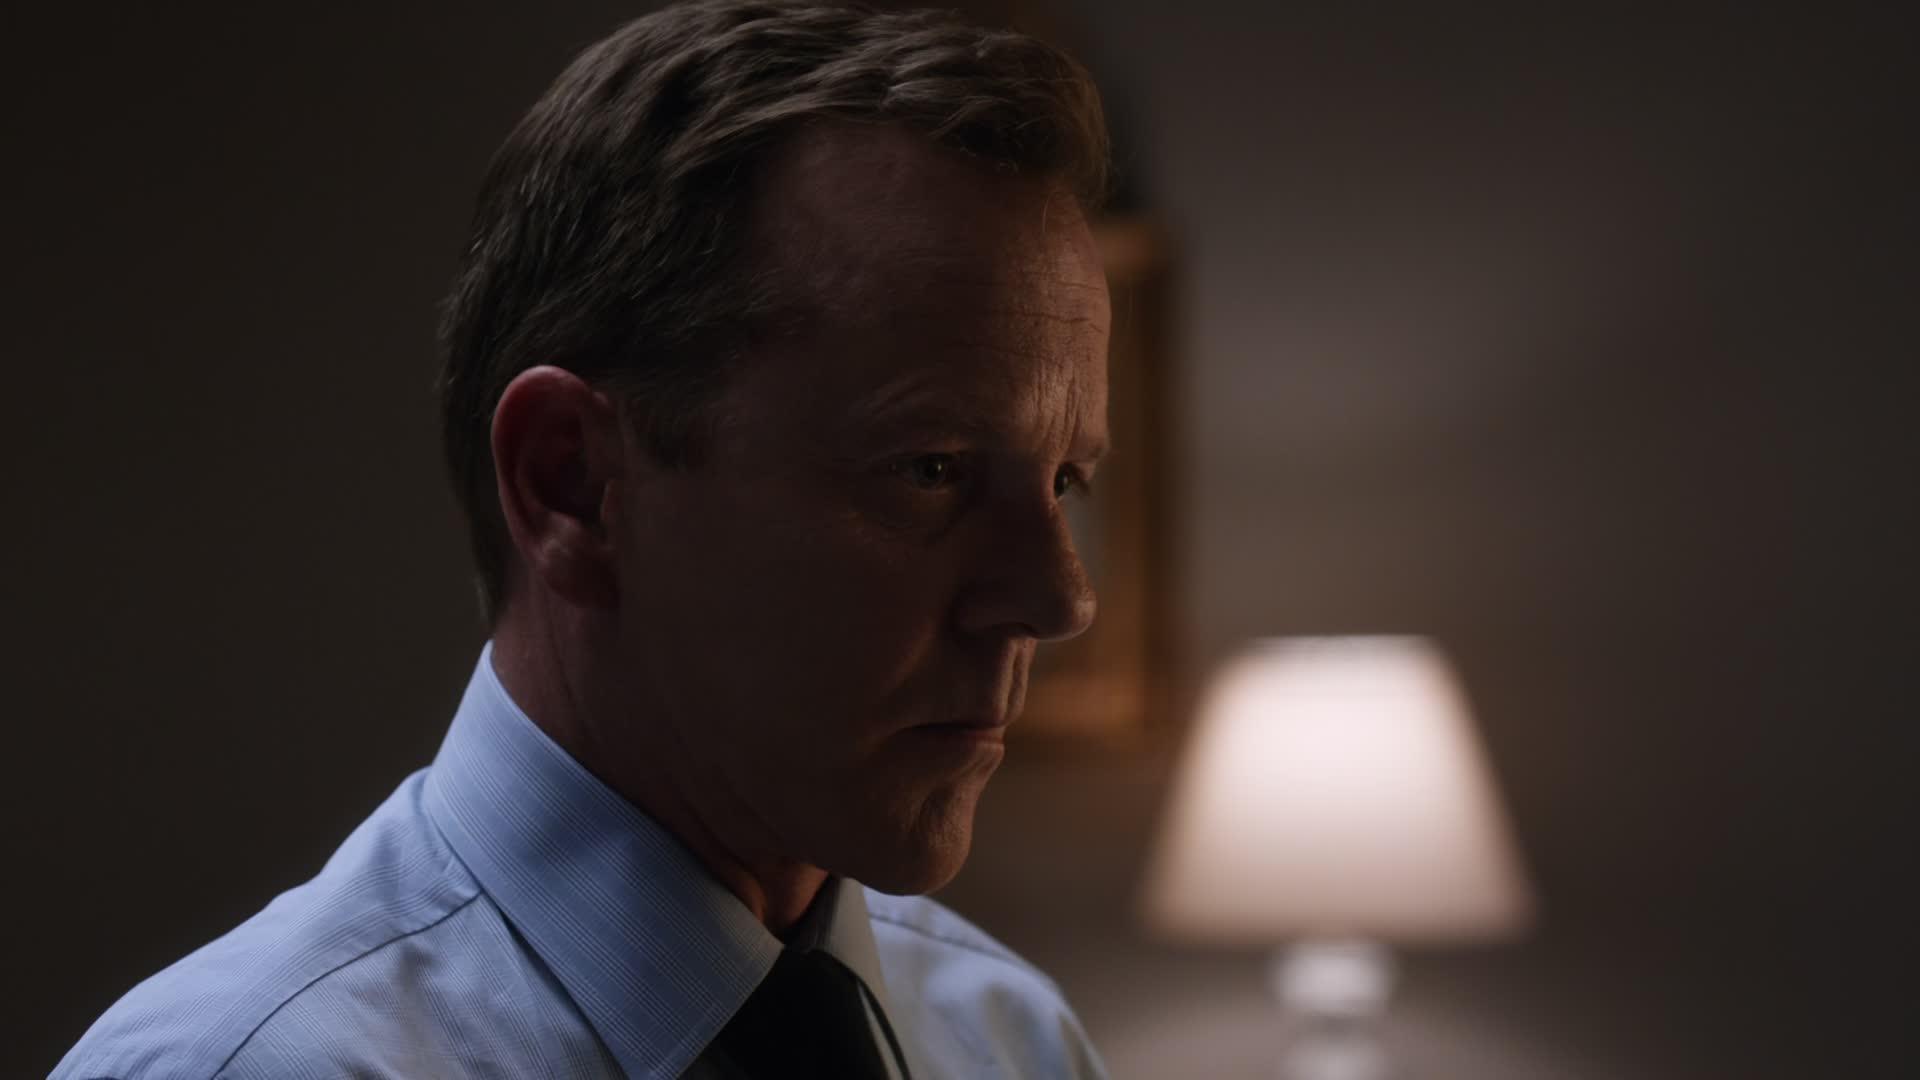 Prezident v poradi - Designated Survivor S01E02 CZ dabing HD 1080p